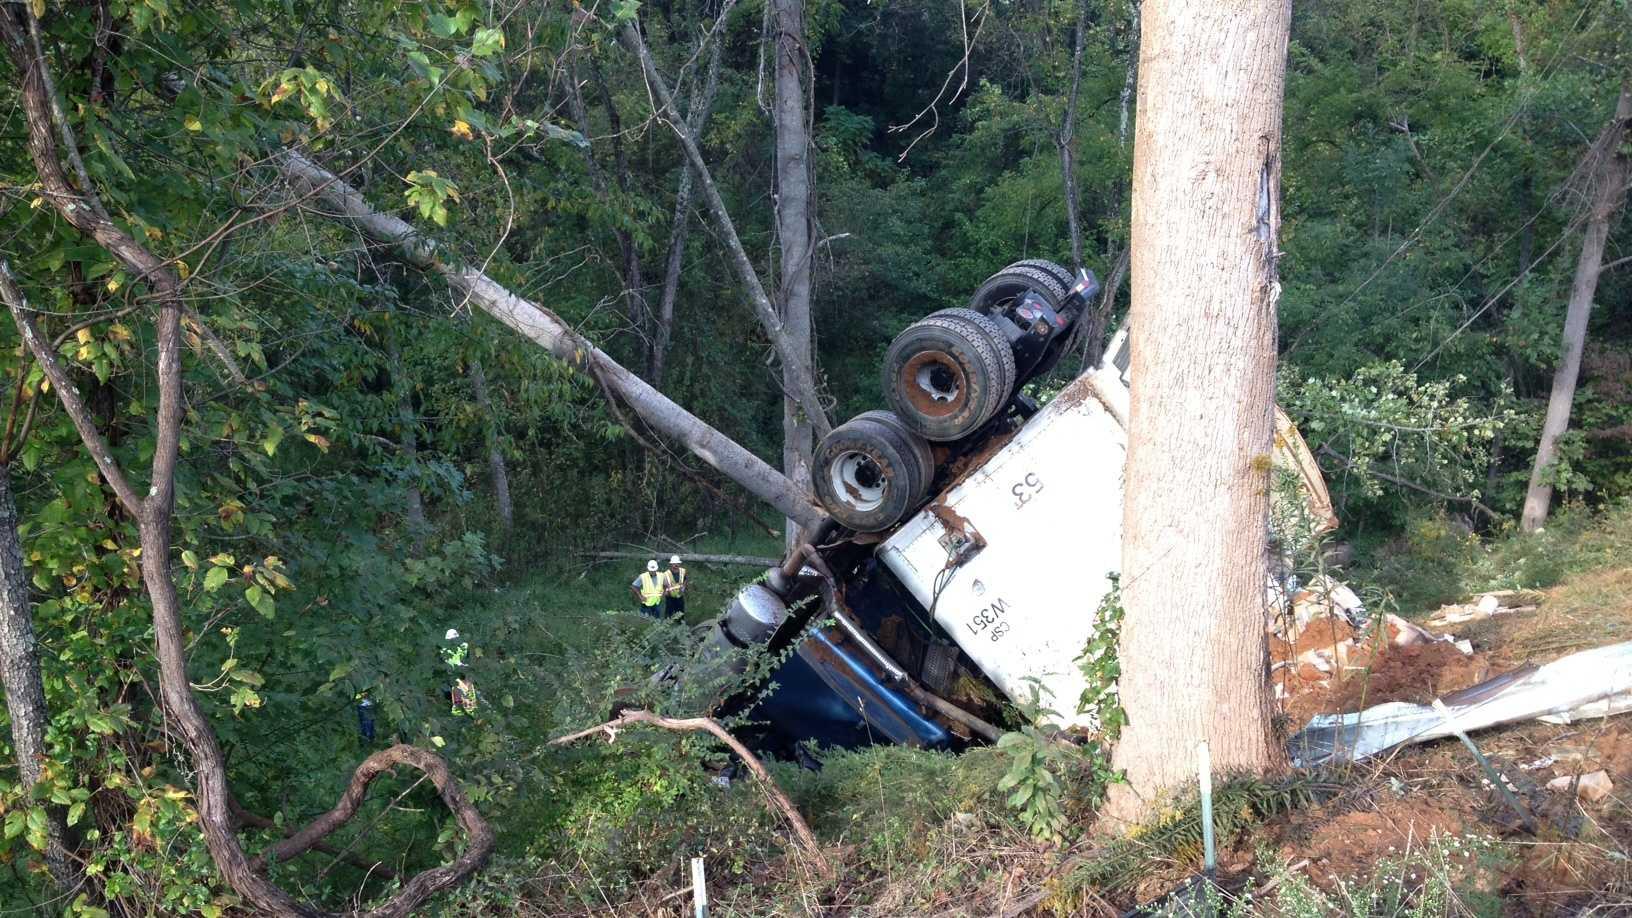 Truck goes down US 52 embankment